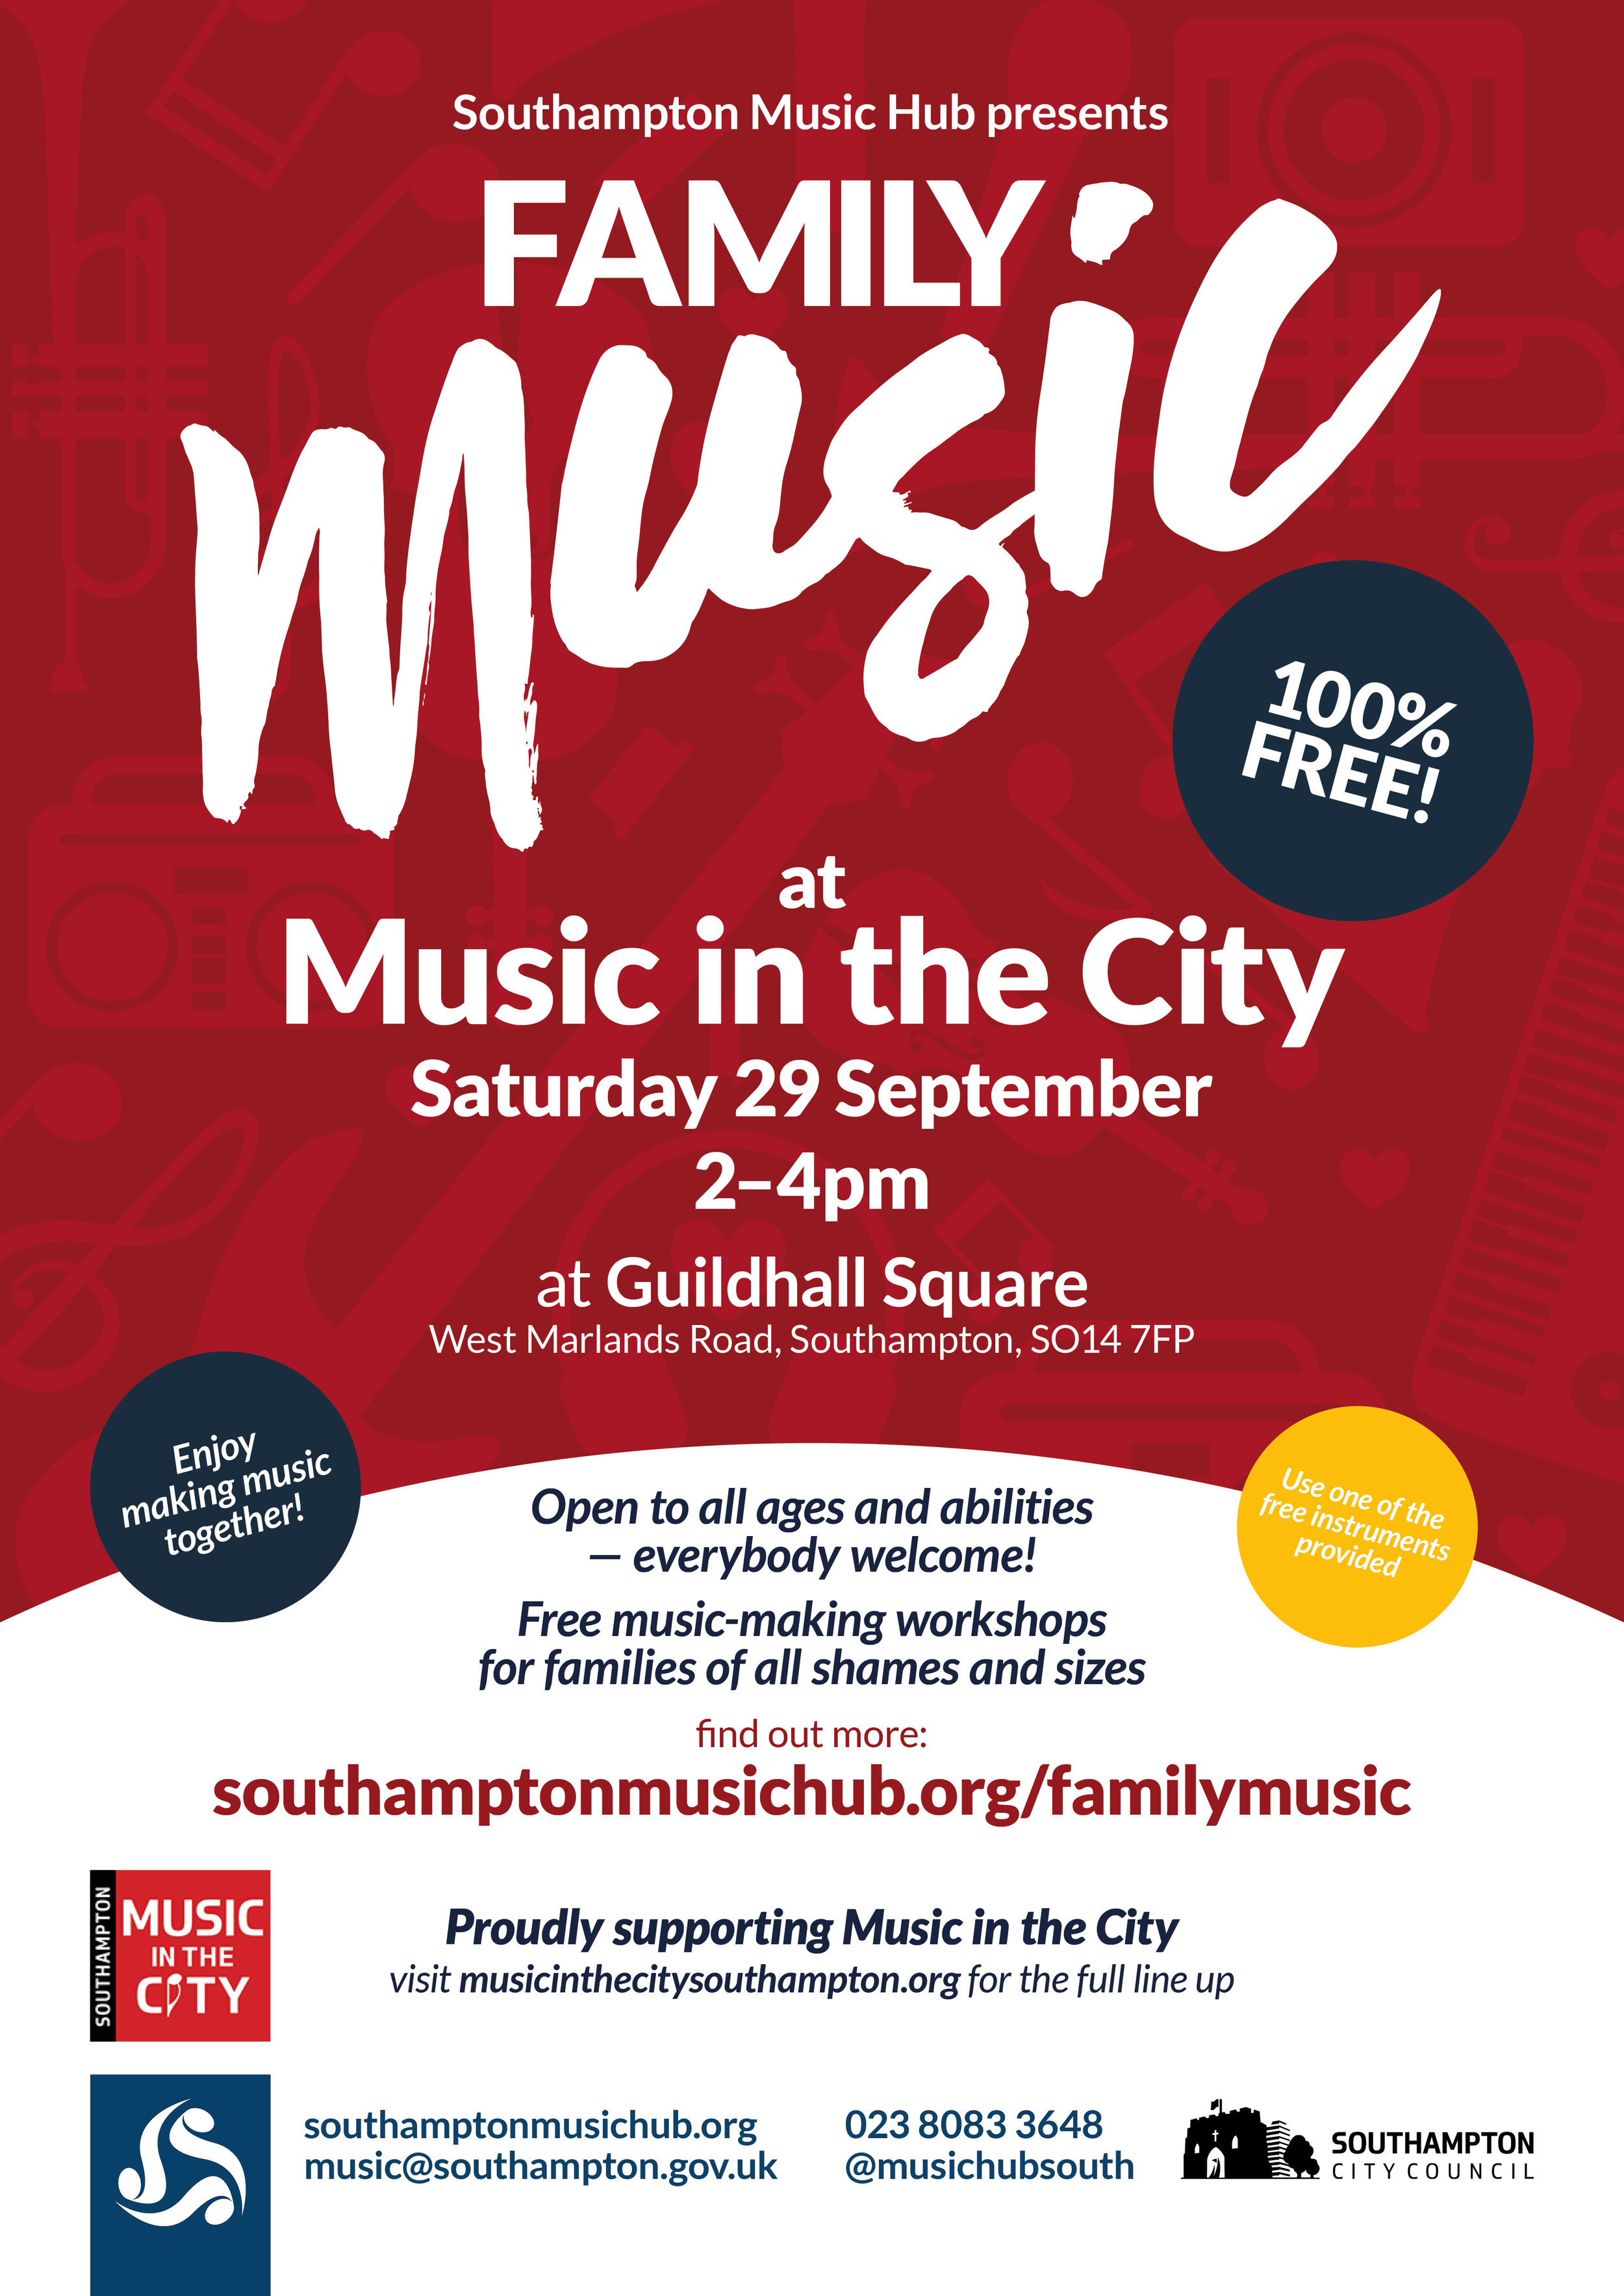 Music in the City 2018 Flyer.jpg